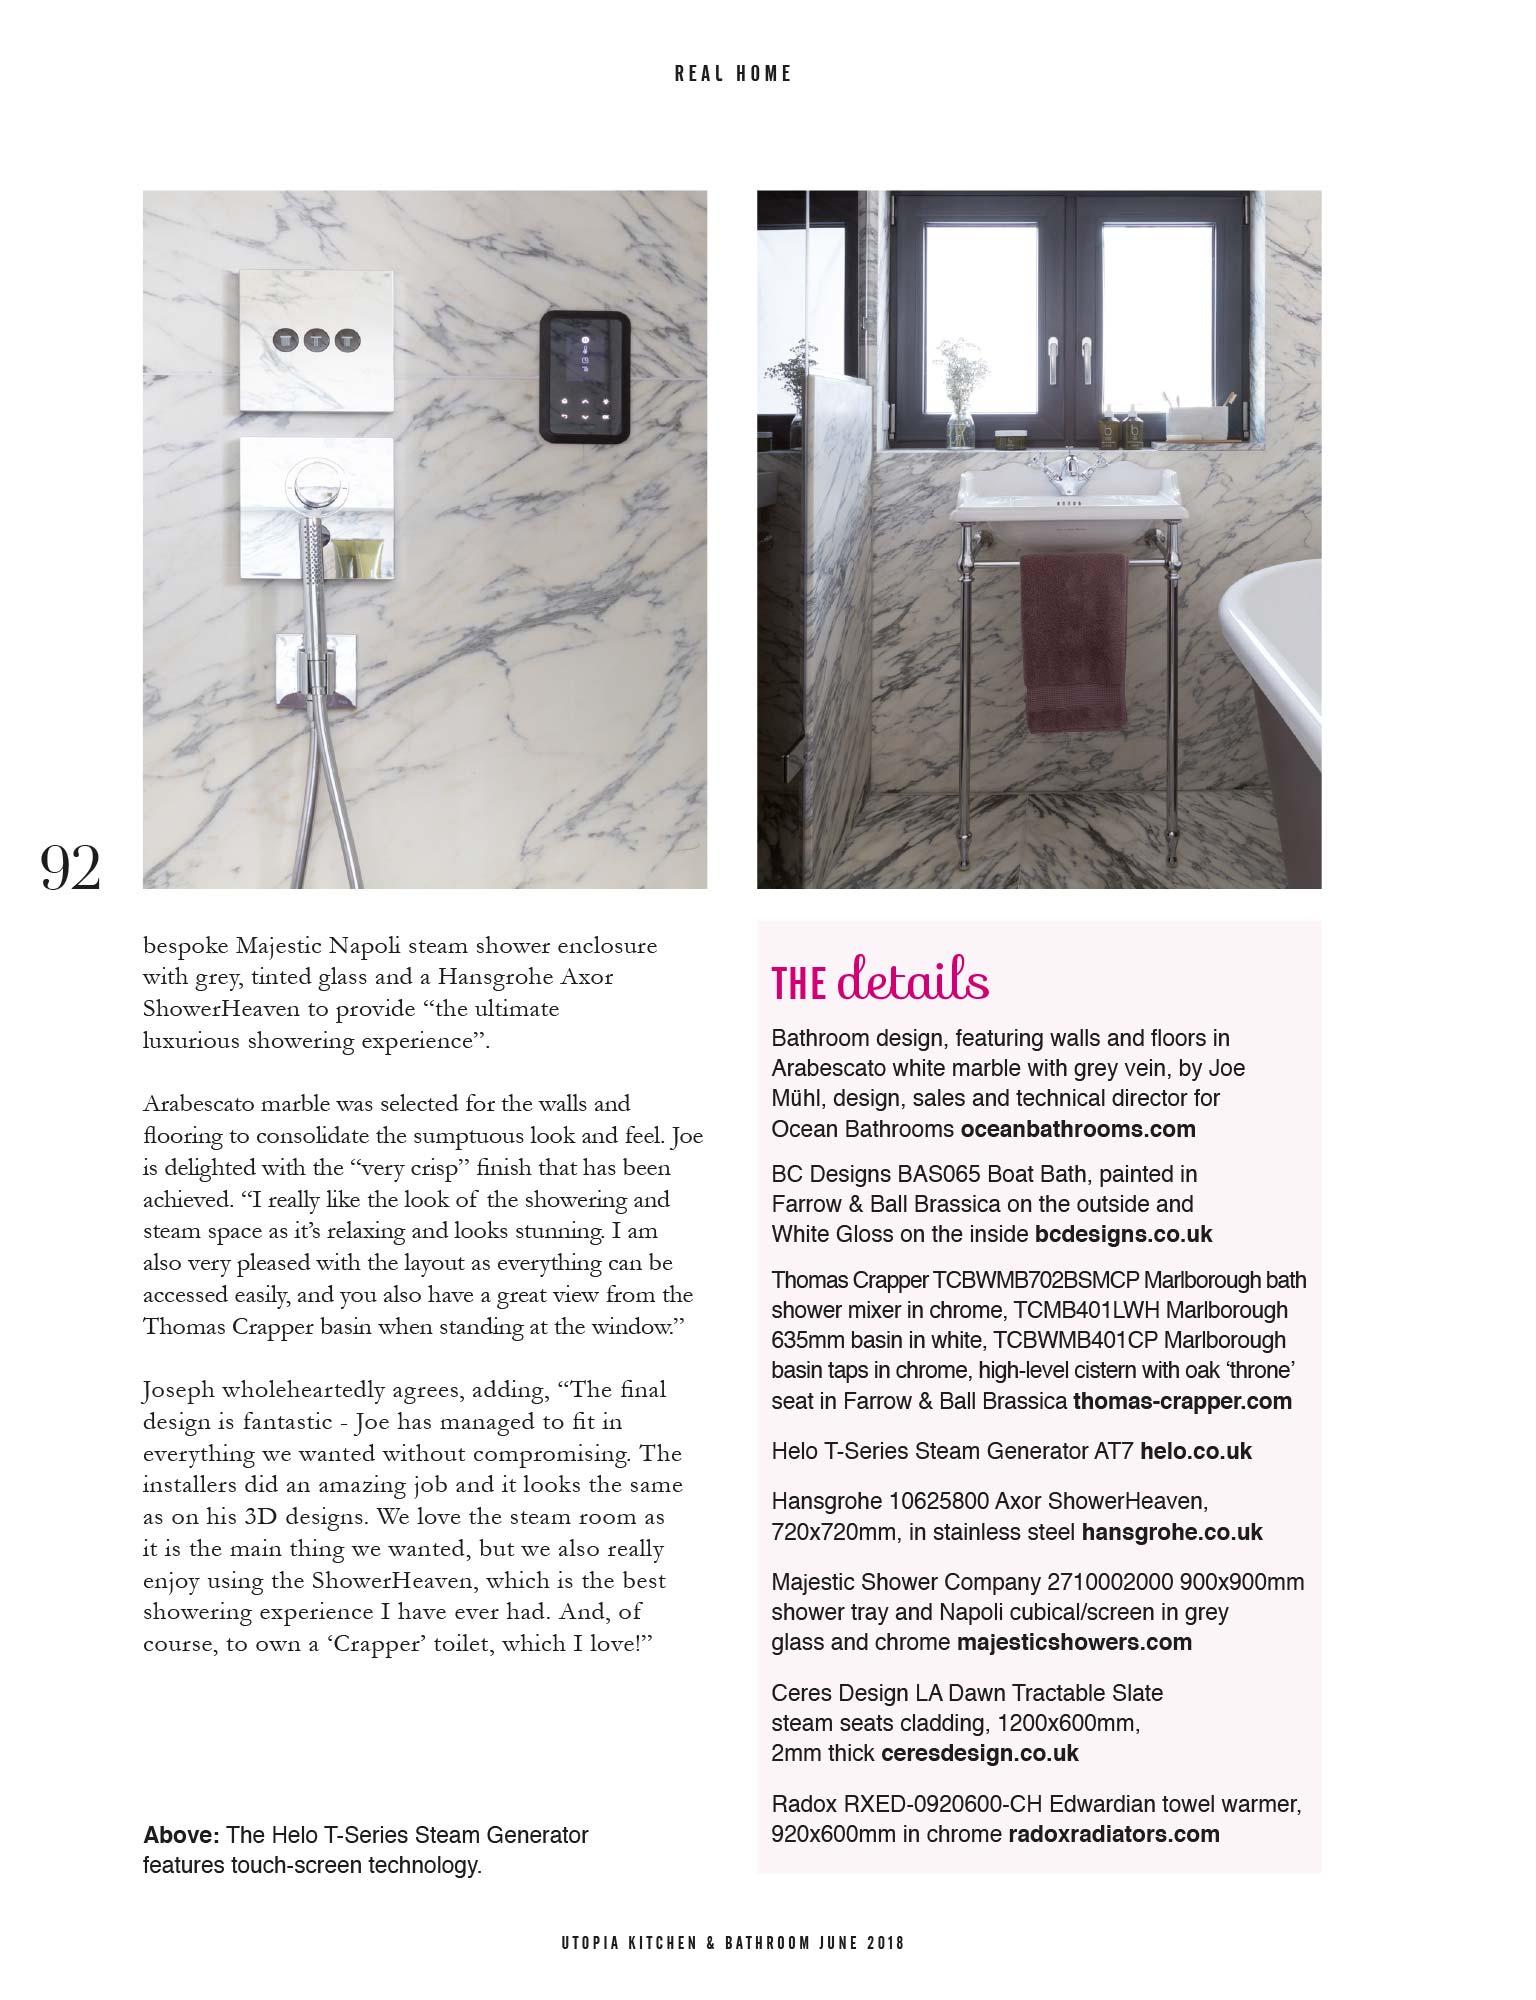 Utopia Kitchen & Bathroom June 2018 - Oxford bathroom